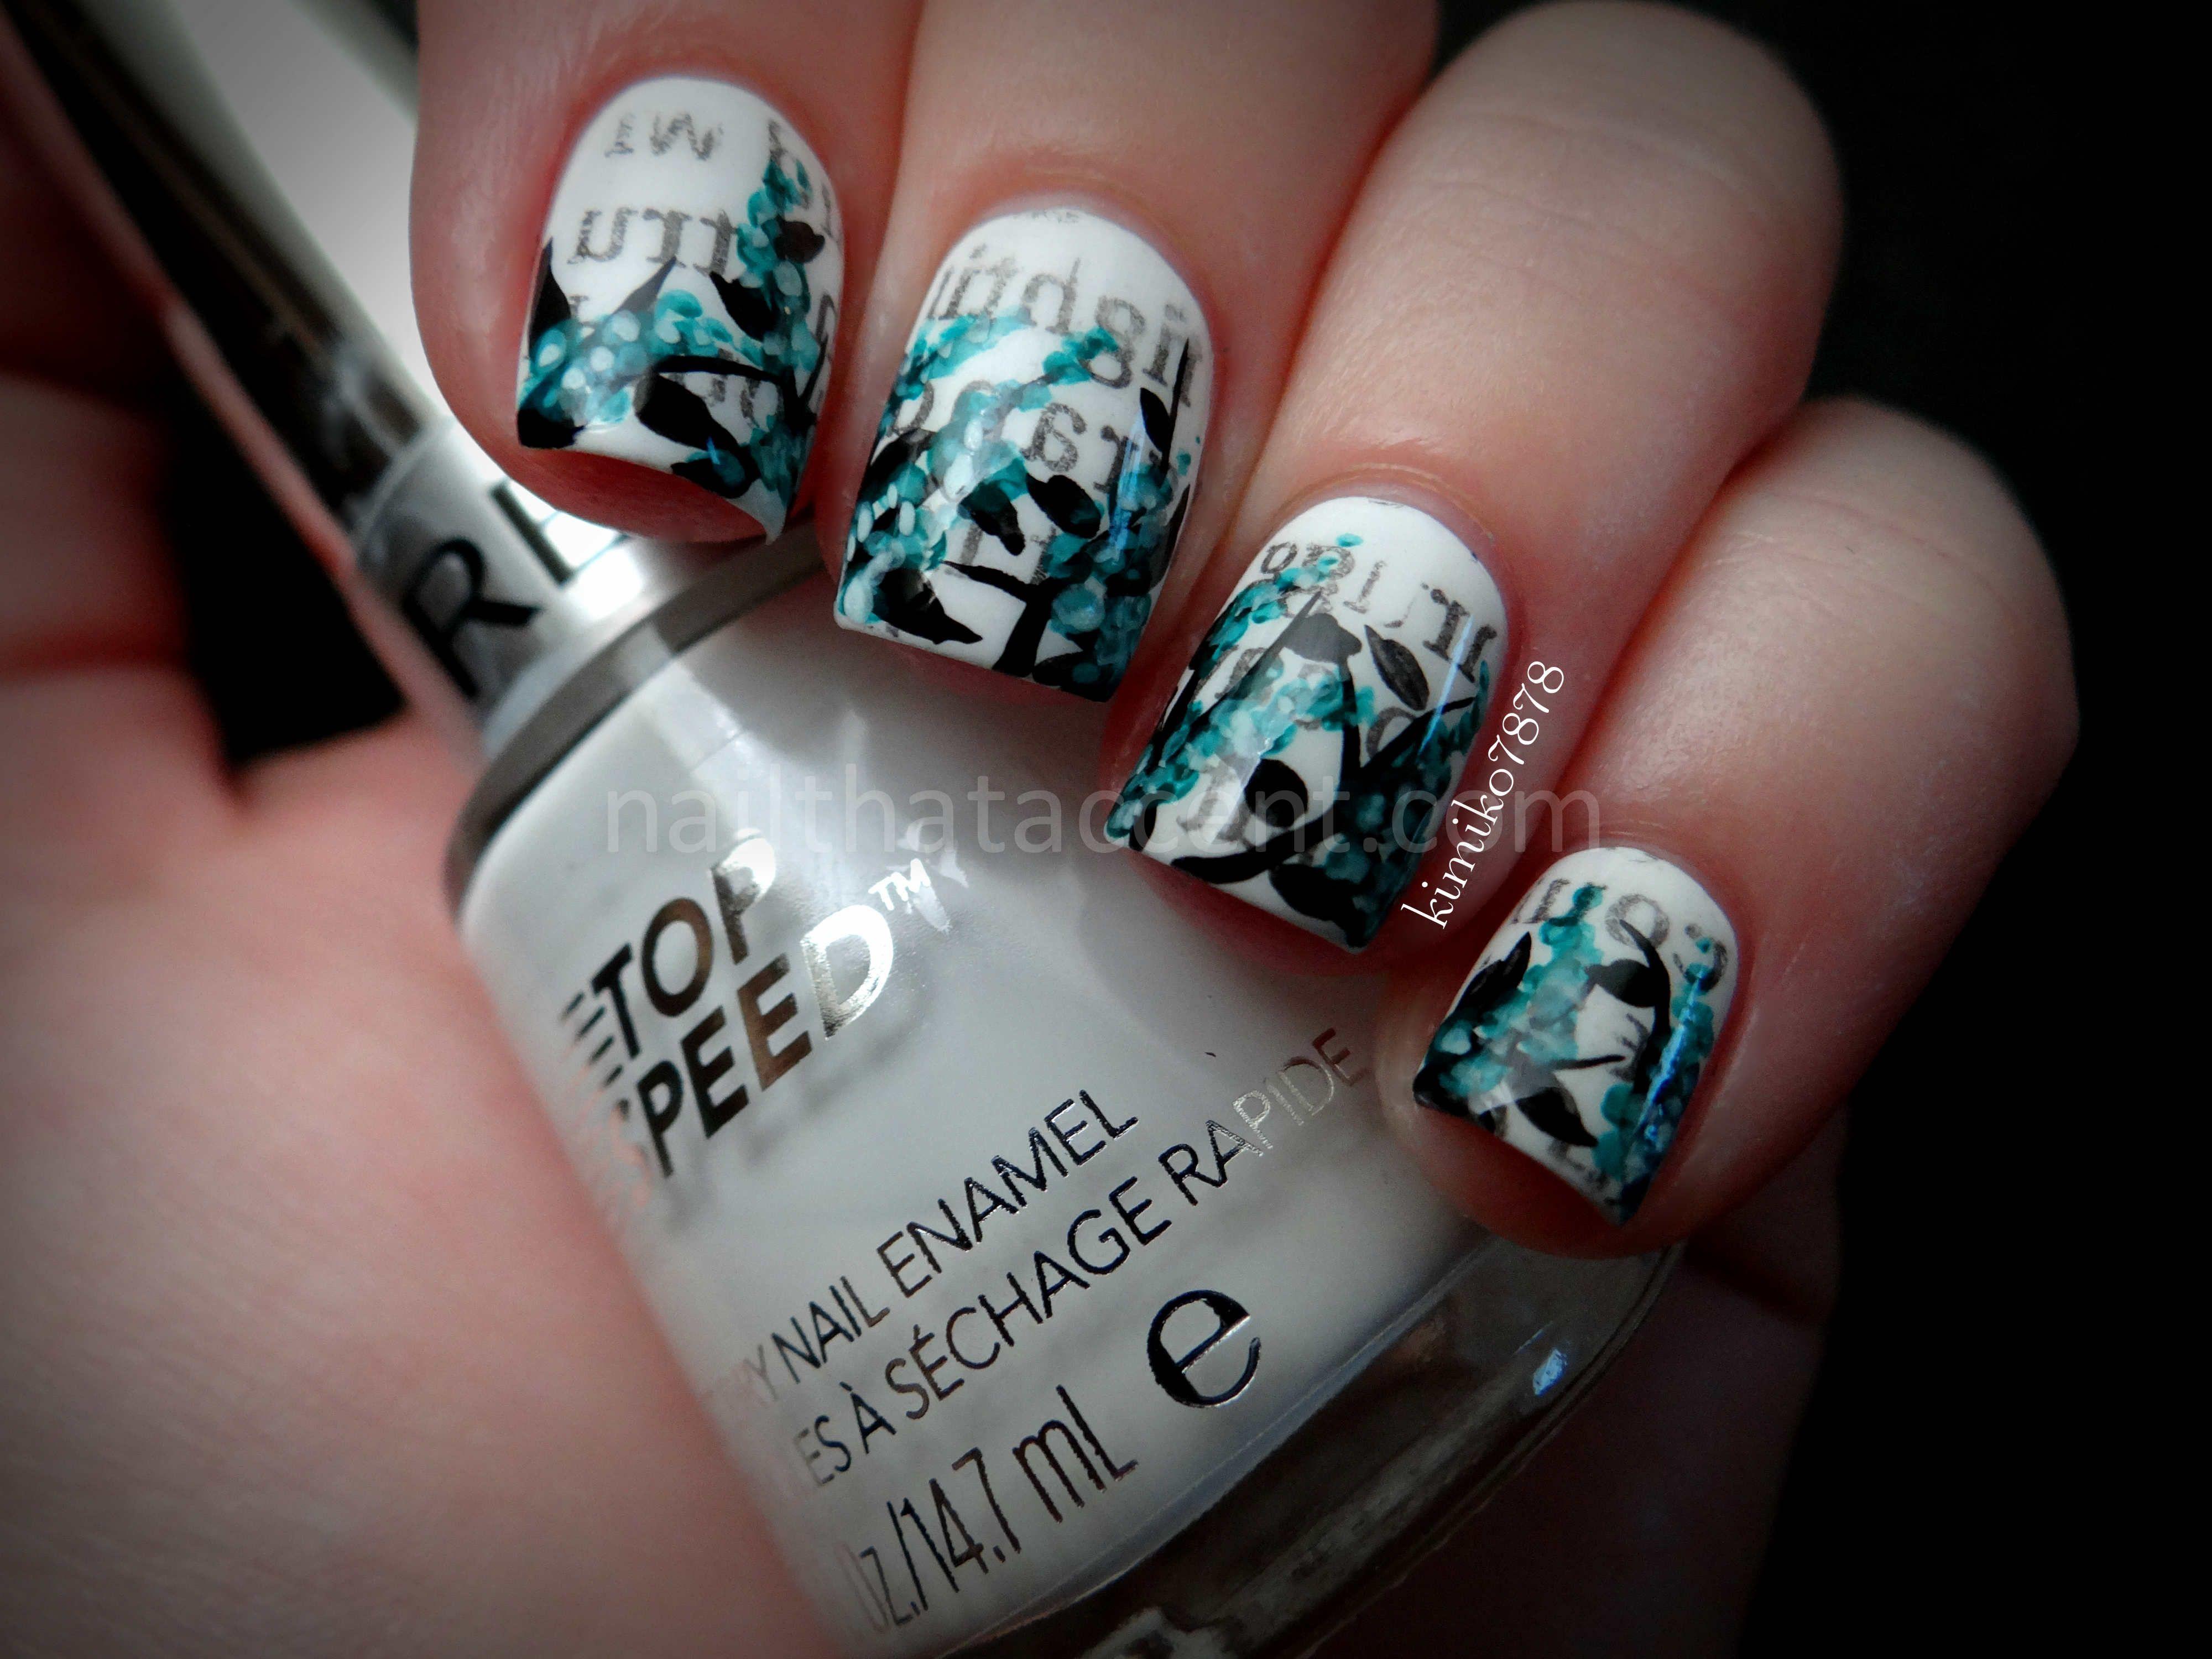 Newspaper nail art | Art | Pinterest | Newspaper nail art and ...